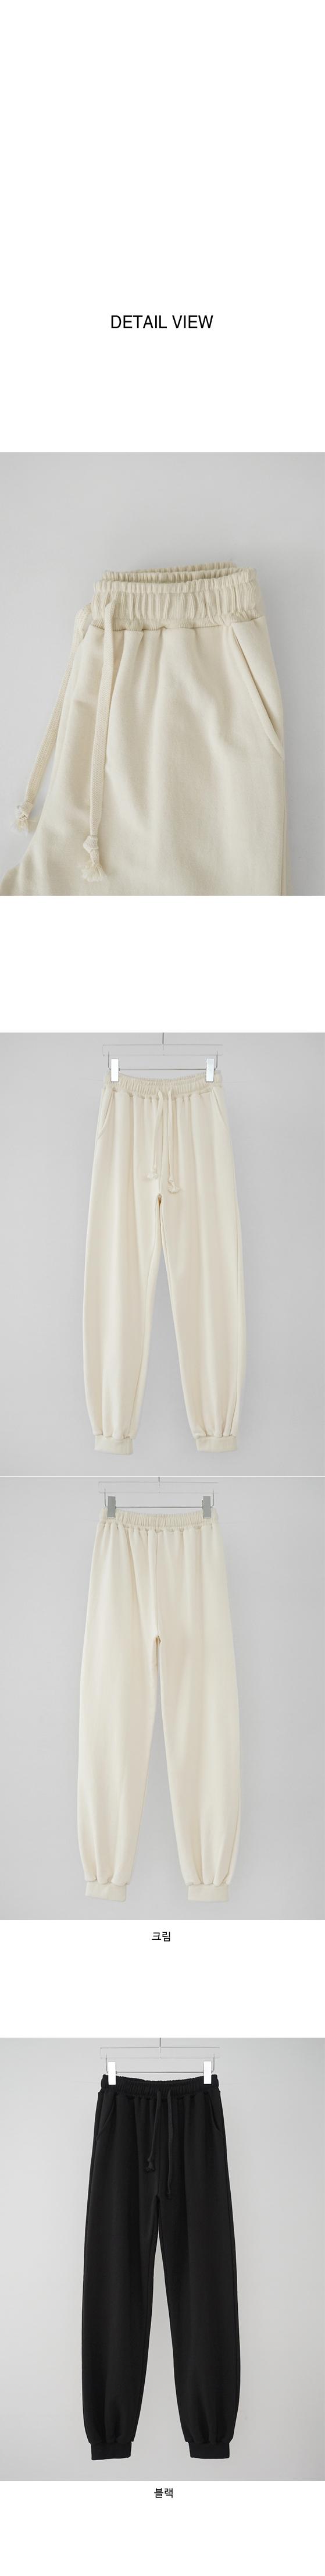 loose-fit jogger pants